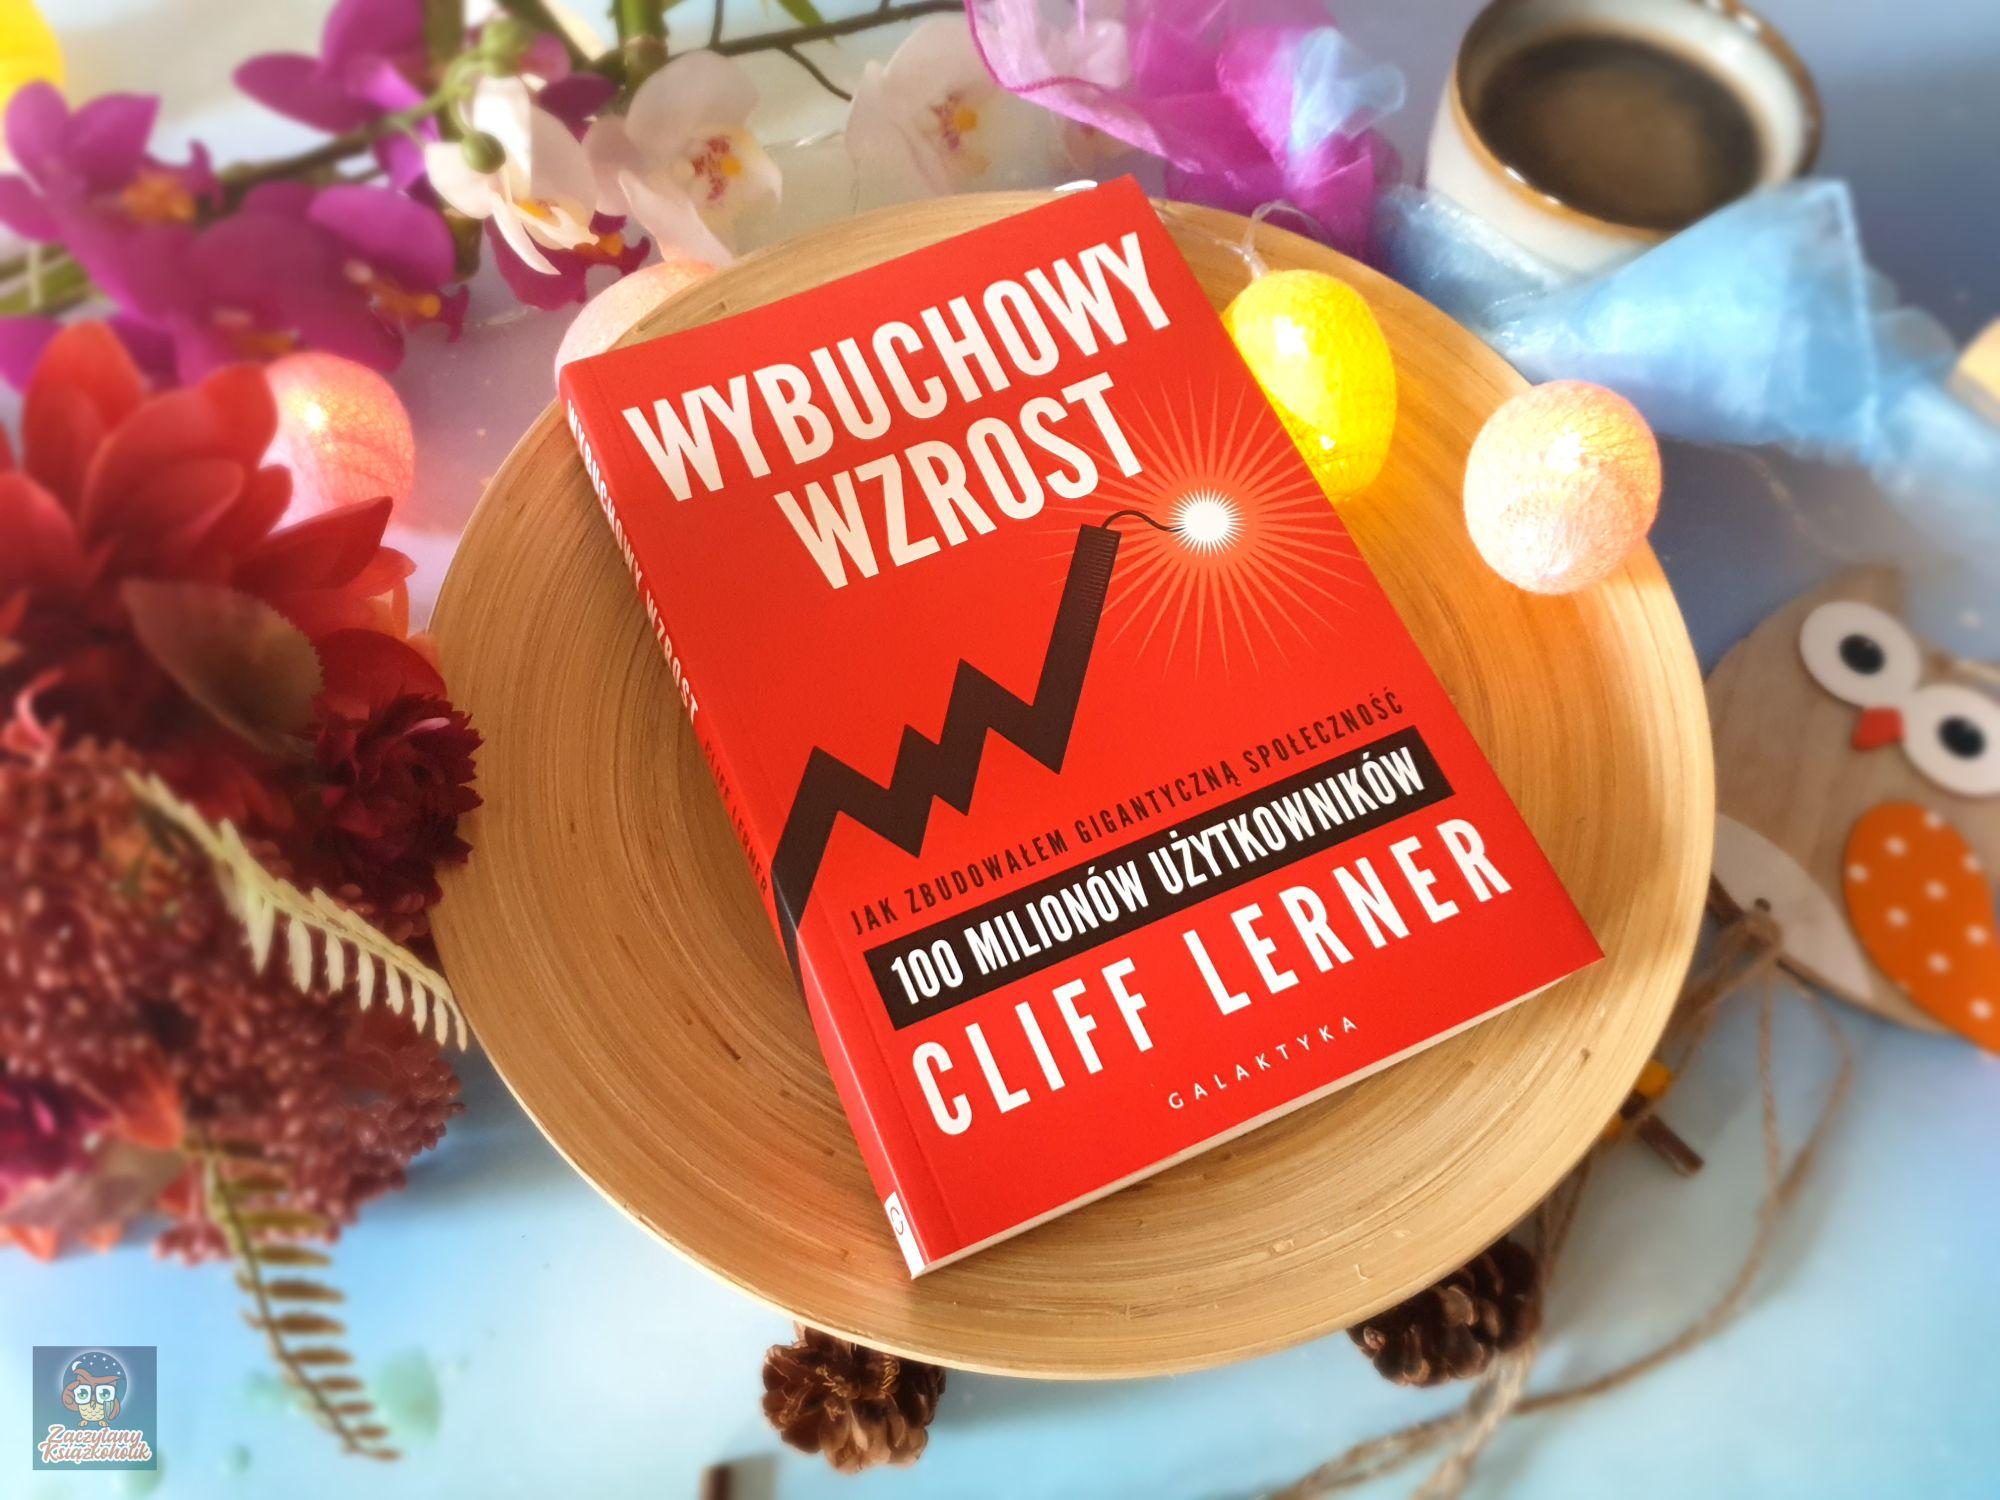 Wybuchowy wzrost, Cliff Lerner, zaczytanyksiazkoholik.pl